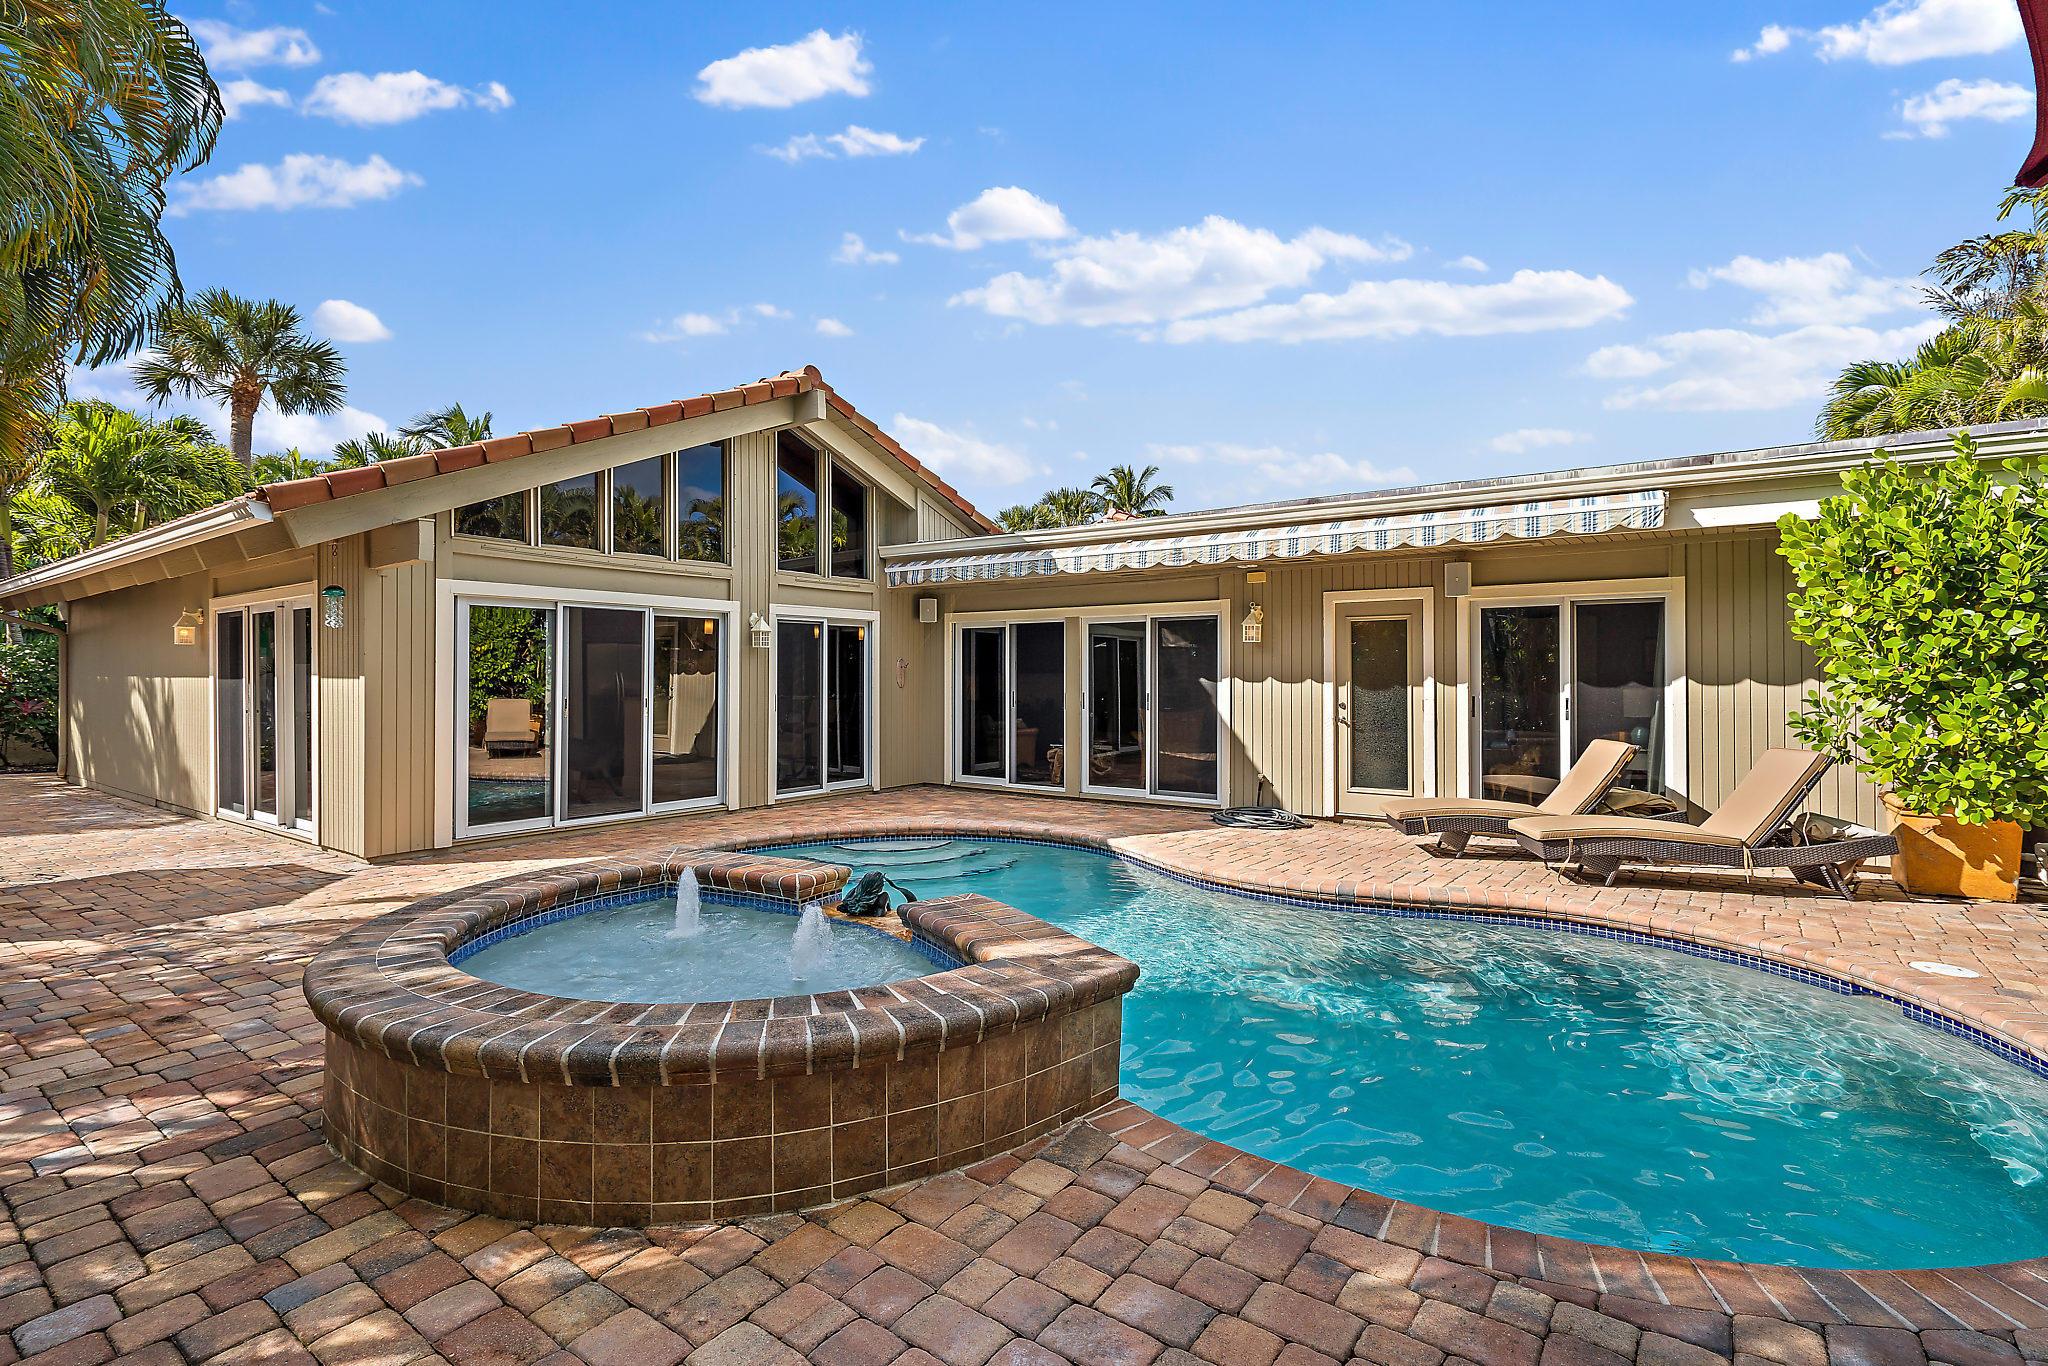 116 Bonefish Circle, Jupiter, Florida 33477, 3 Bedrooms Bedrooms, ,2 BathroomsBathrooms,Single Family,For Rent,Ocean Walk,Bonefish,1,RX-10503337